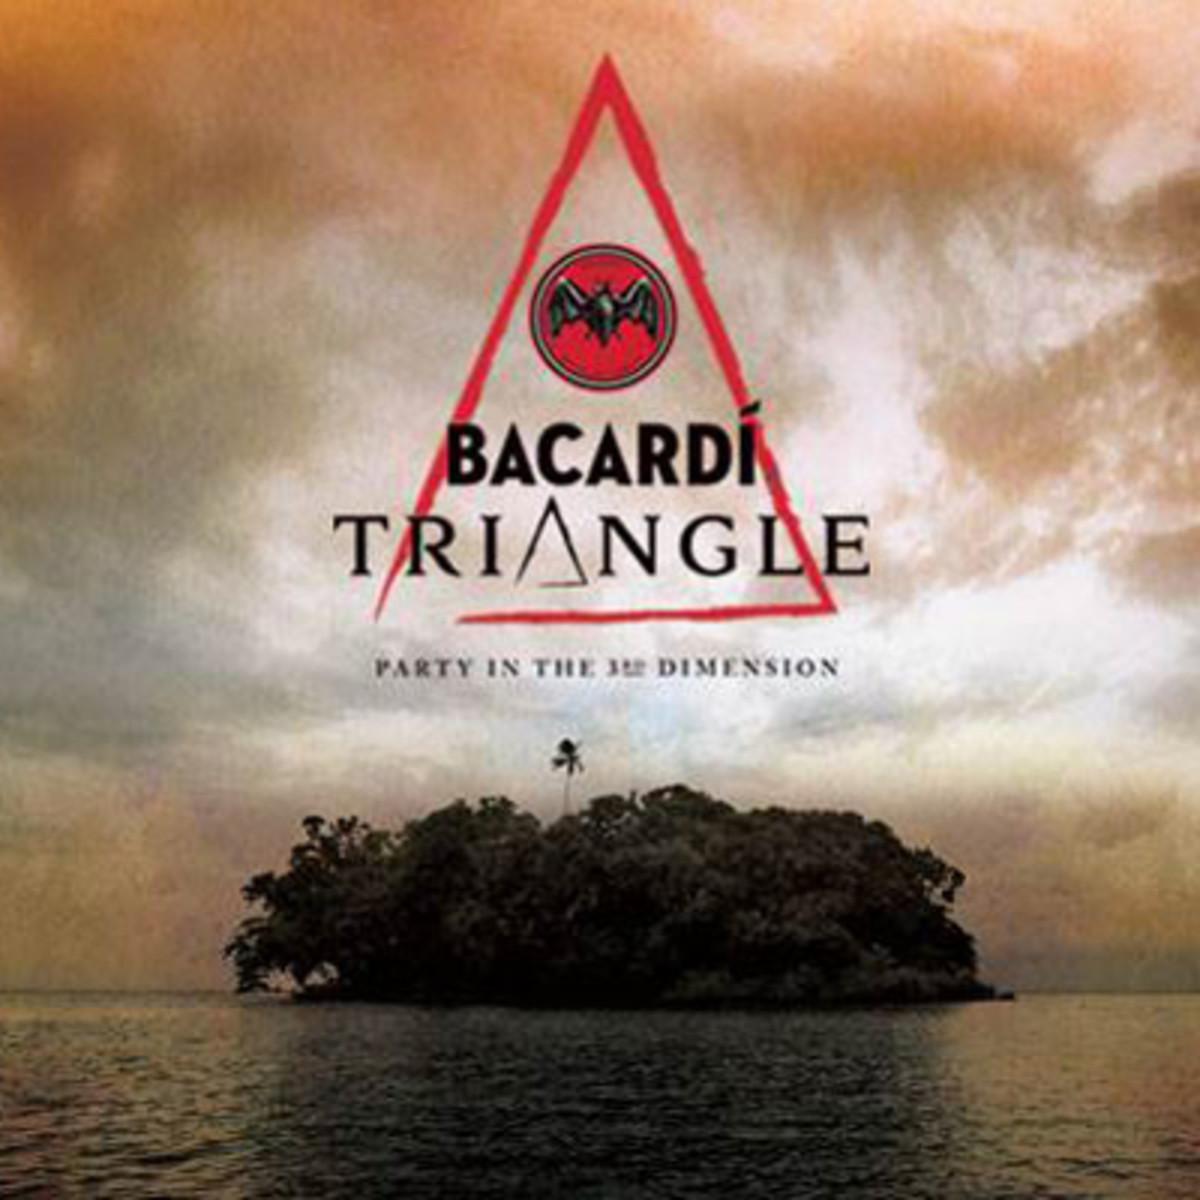 bacardi-triangle.jpg